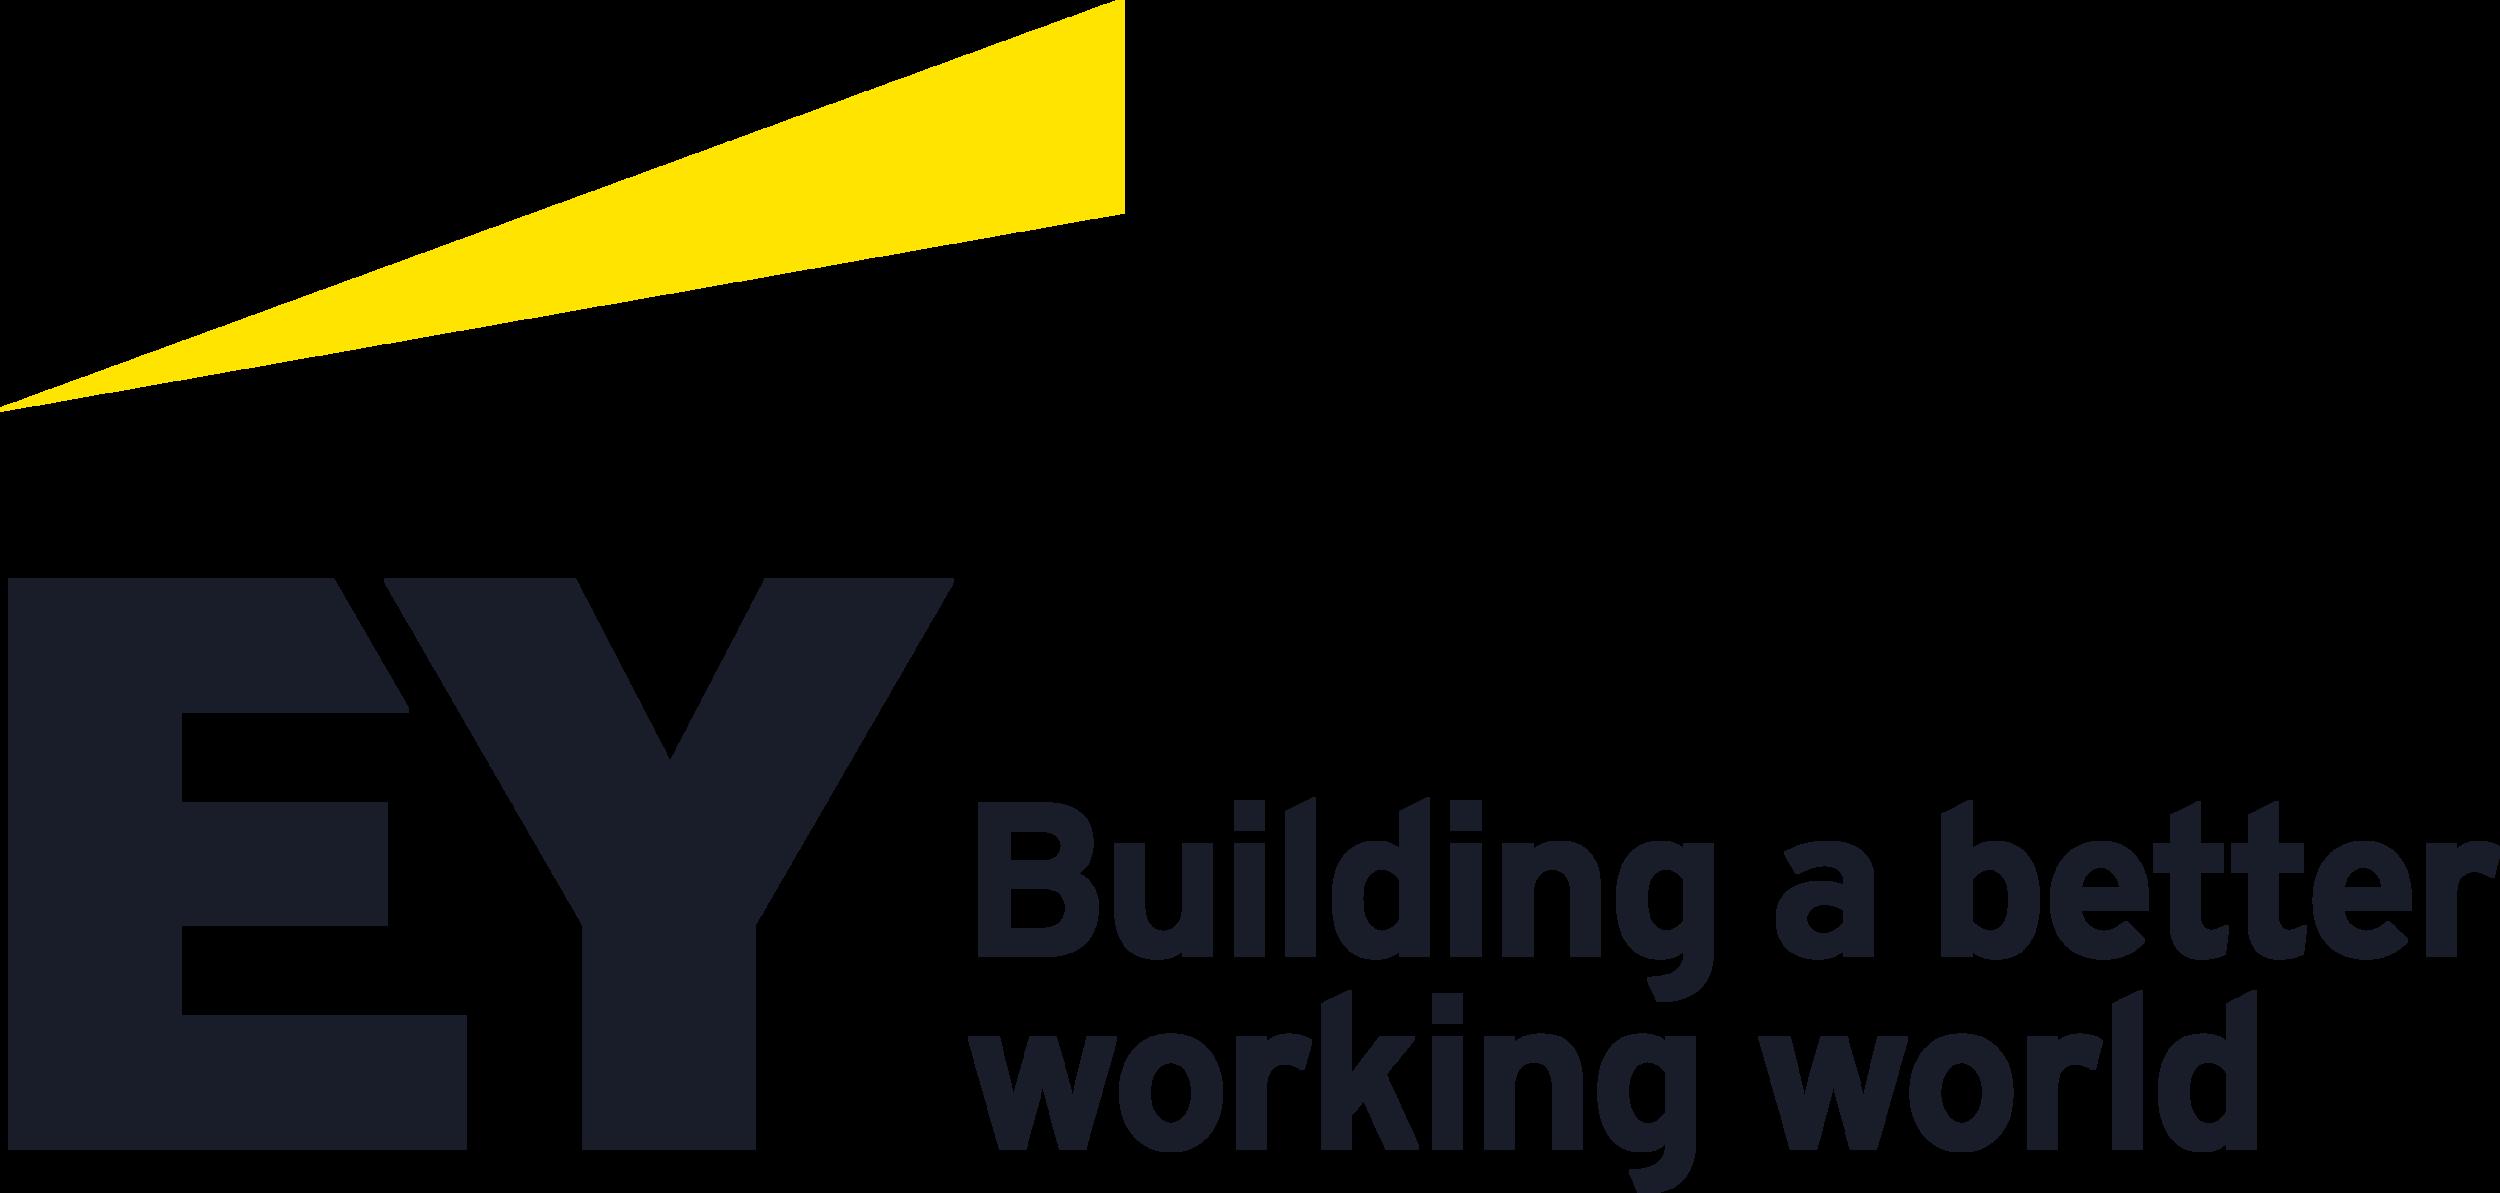 EY_Logo_Horizontal lockup_Print use_CMYK.png